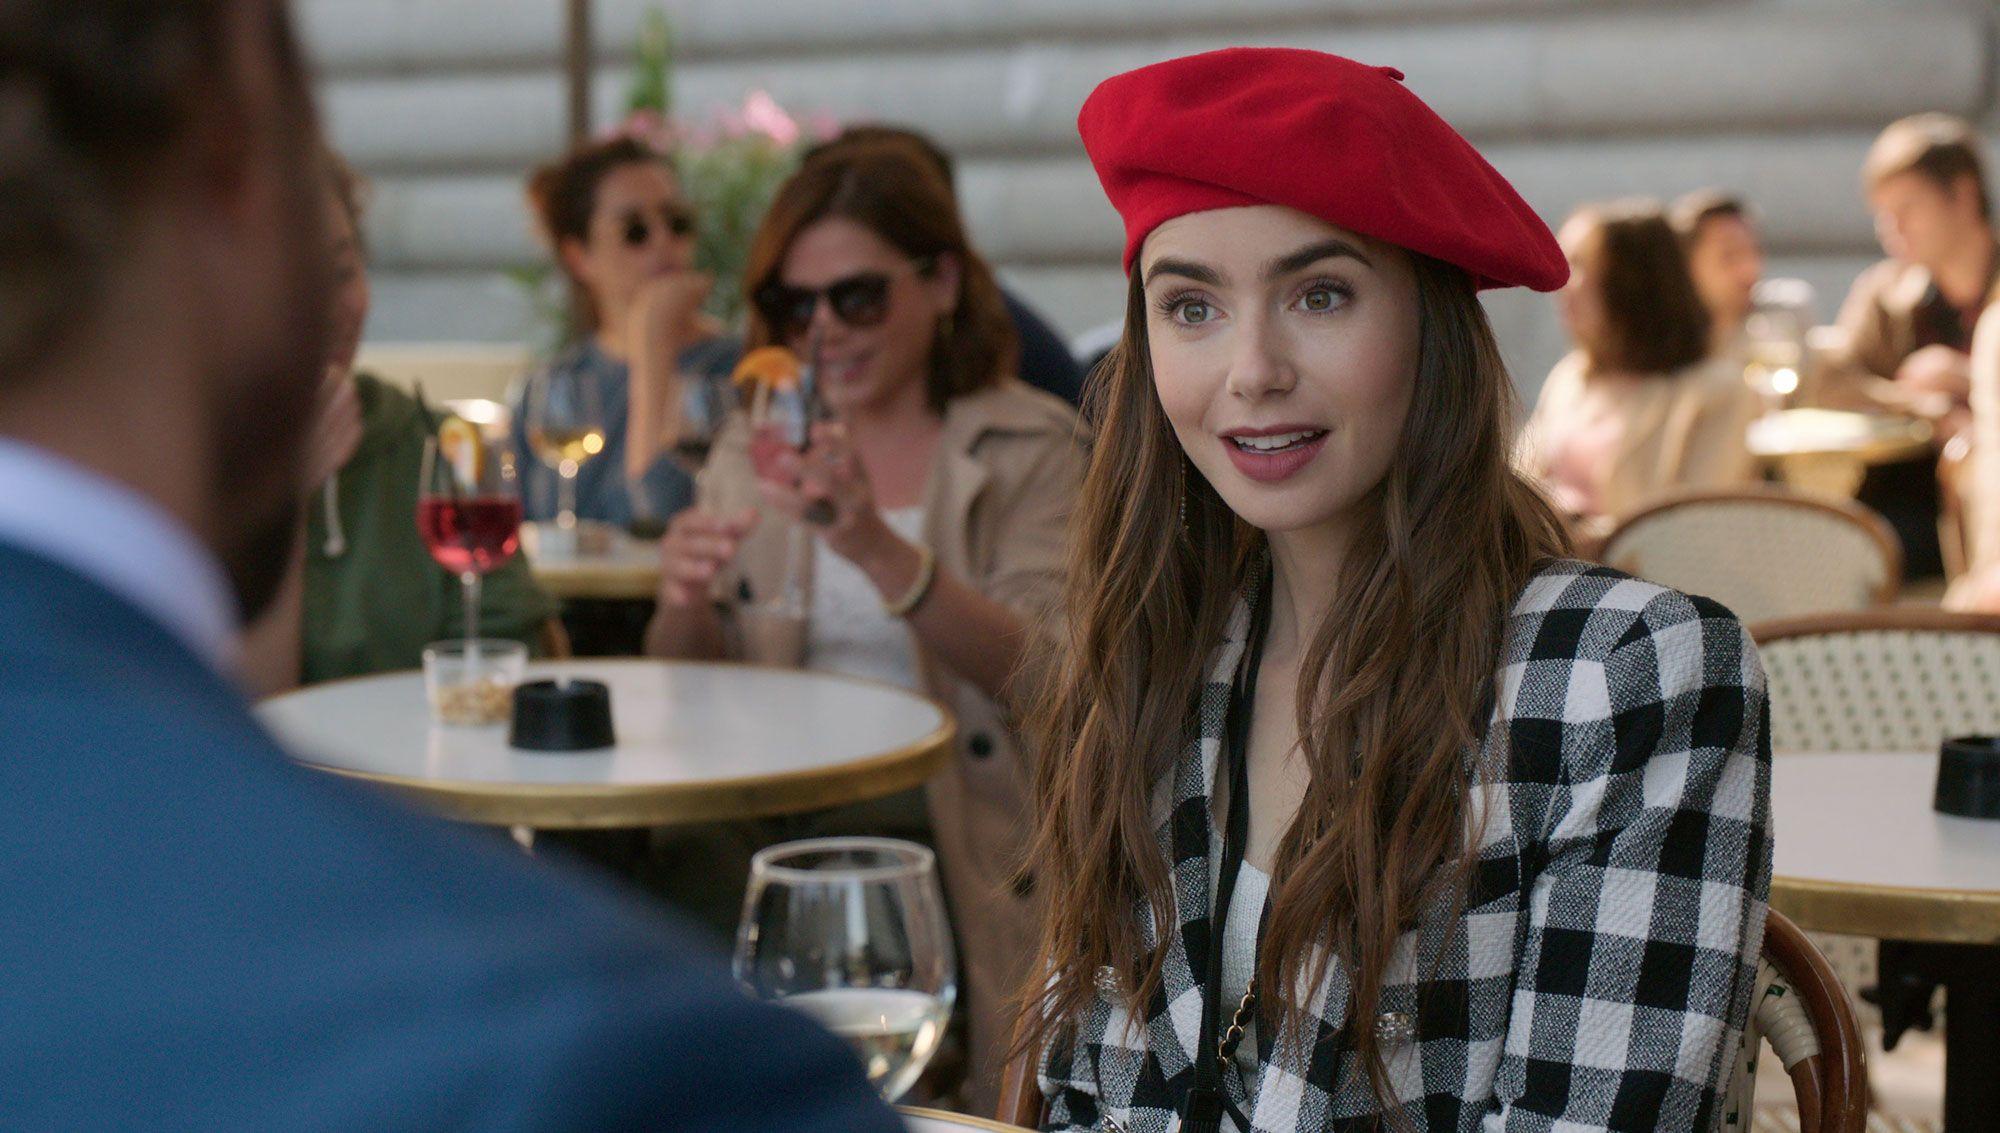 Emily in Paris: Οι Γάλλοι είναι έξαλλοι με τη νέα σειρά του Netflix και δεν το κρύβουν!